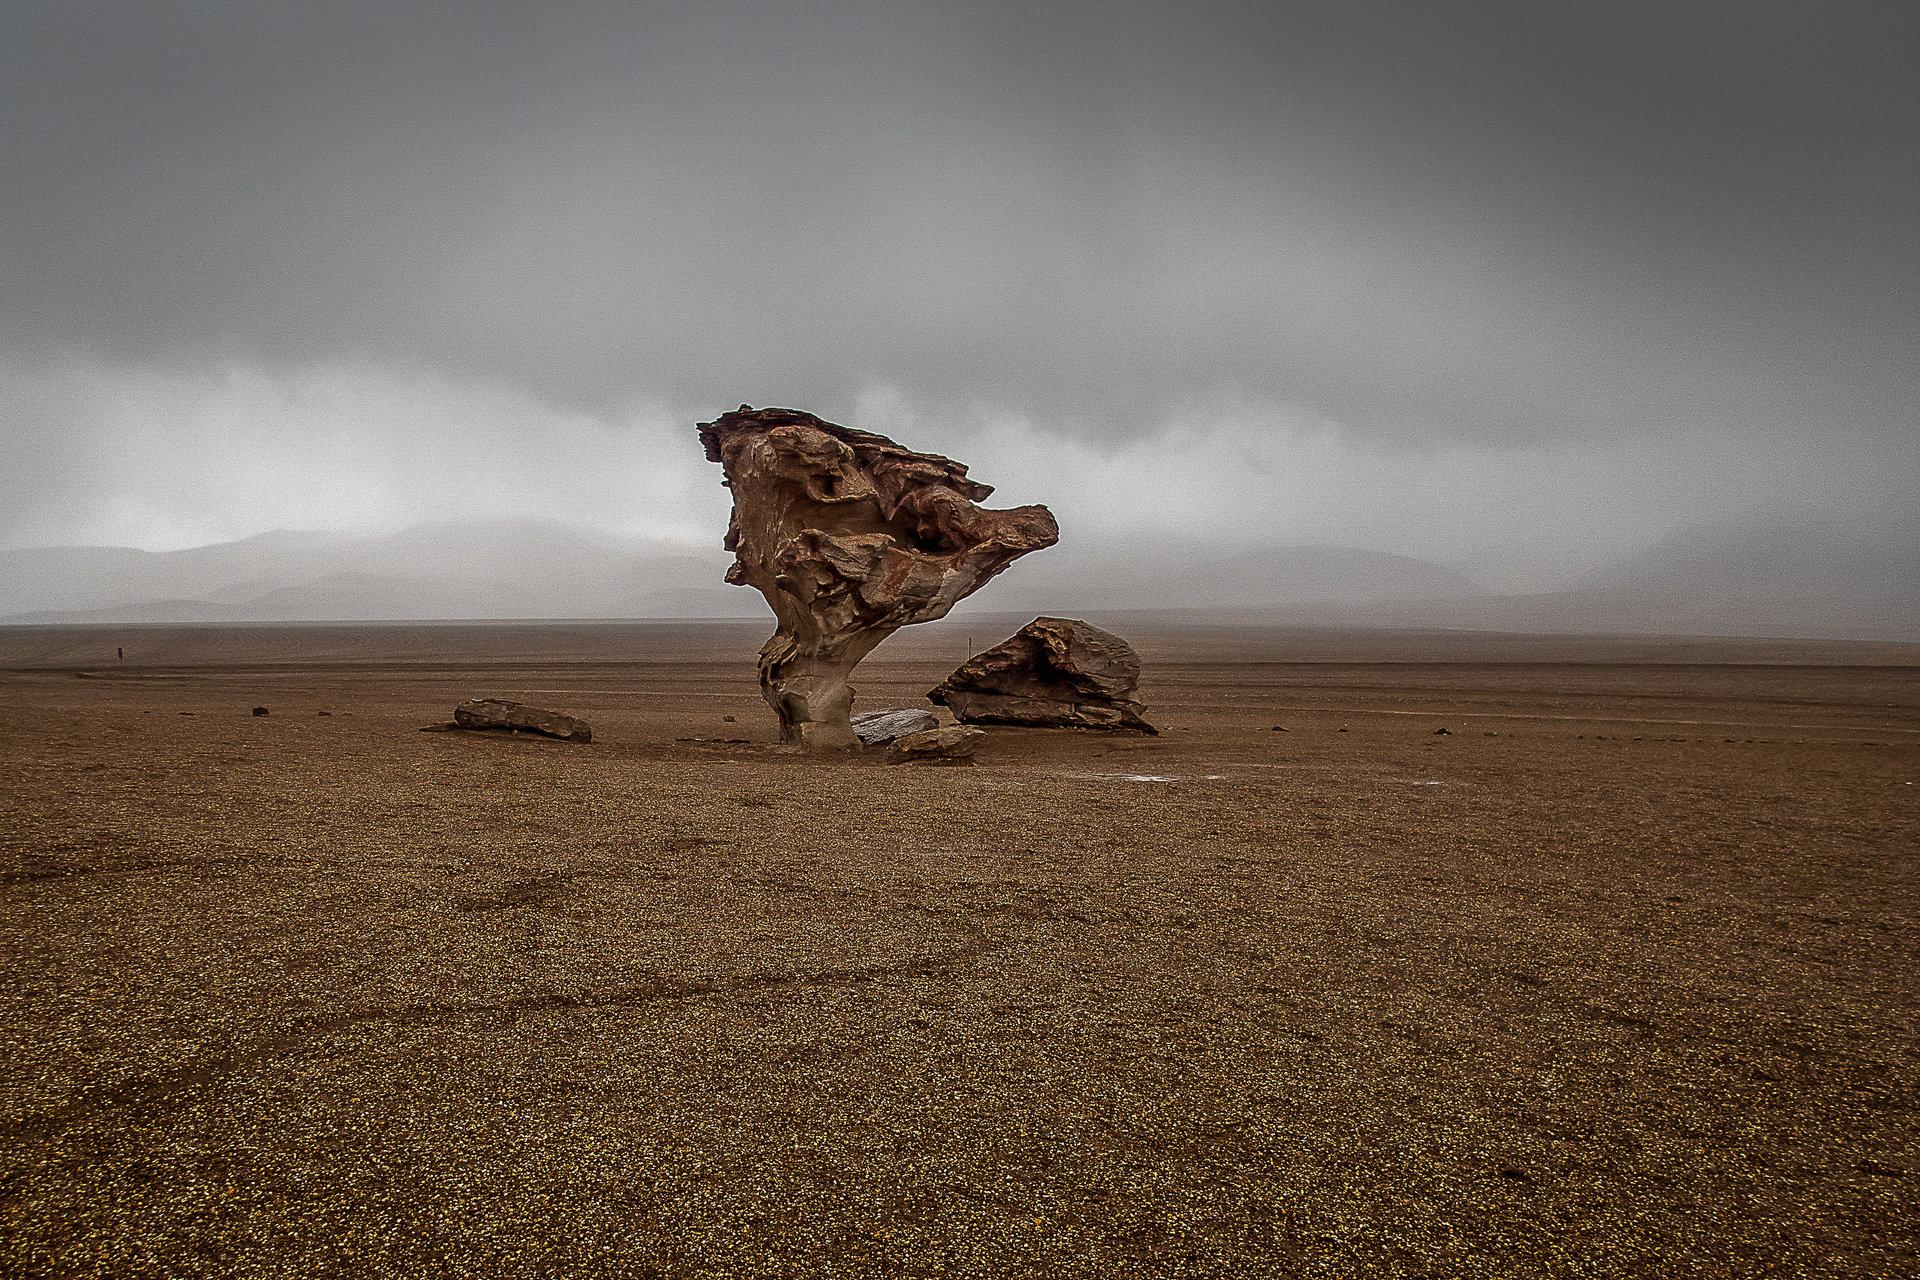 Stone tree   Author Ivelina Berova - ivabor   PHOTO FORUM